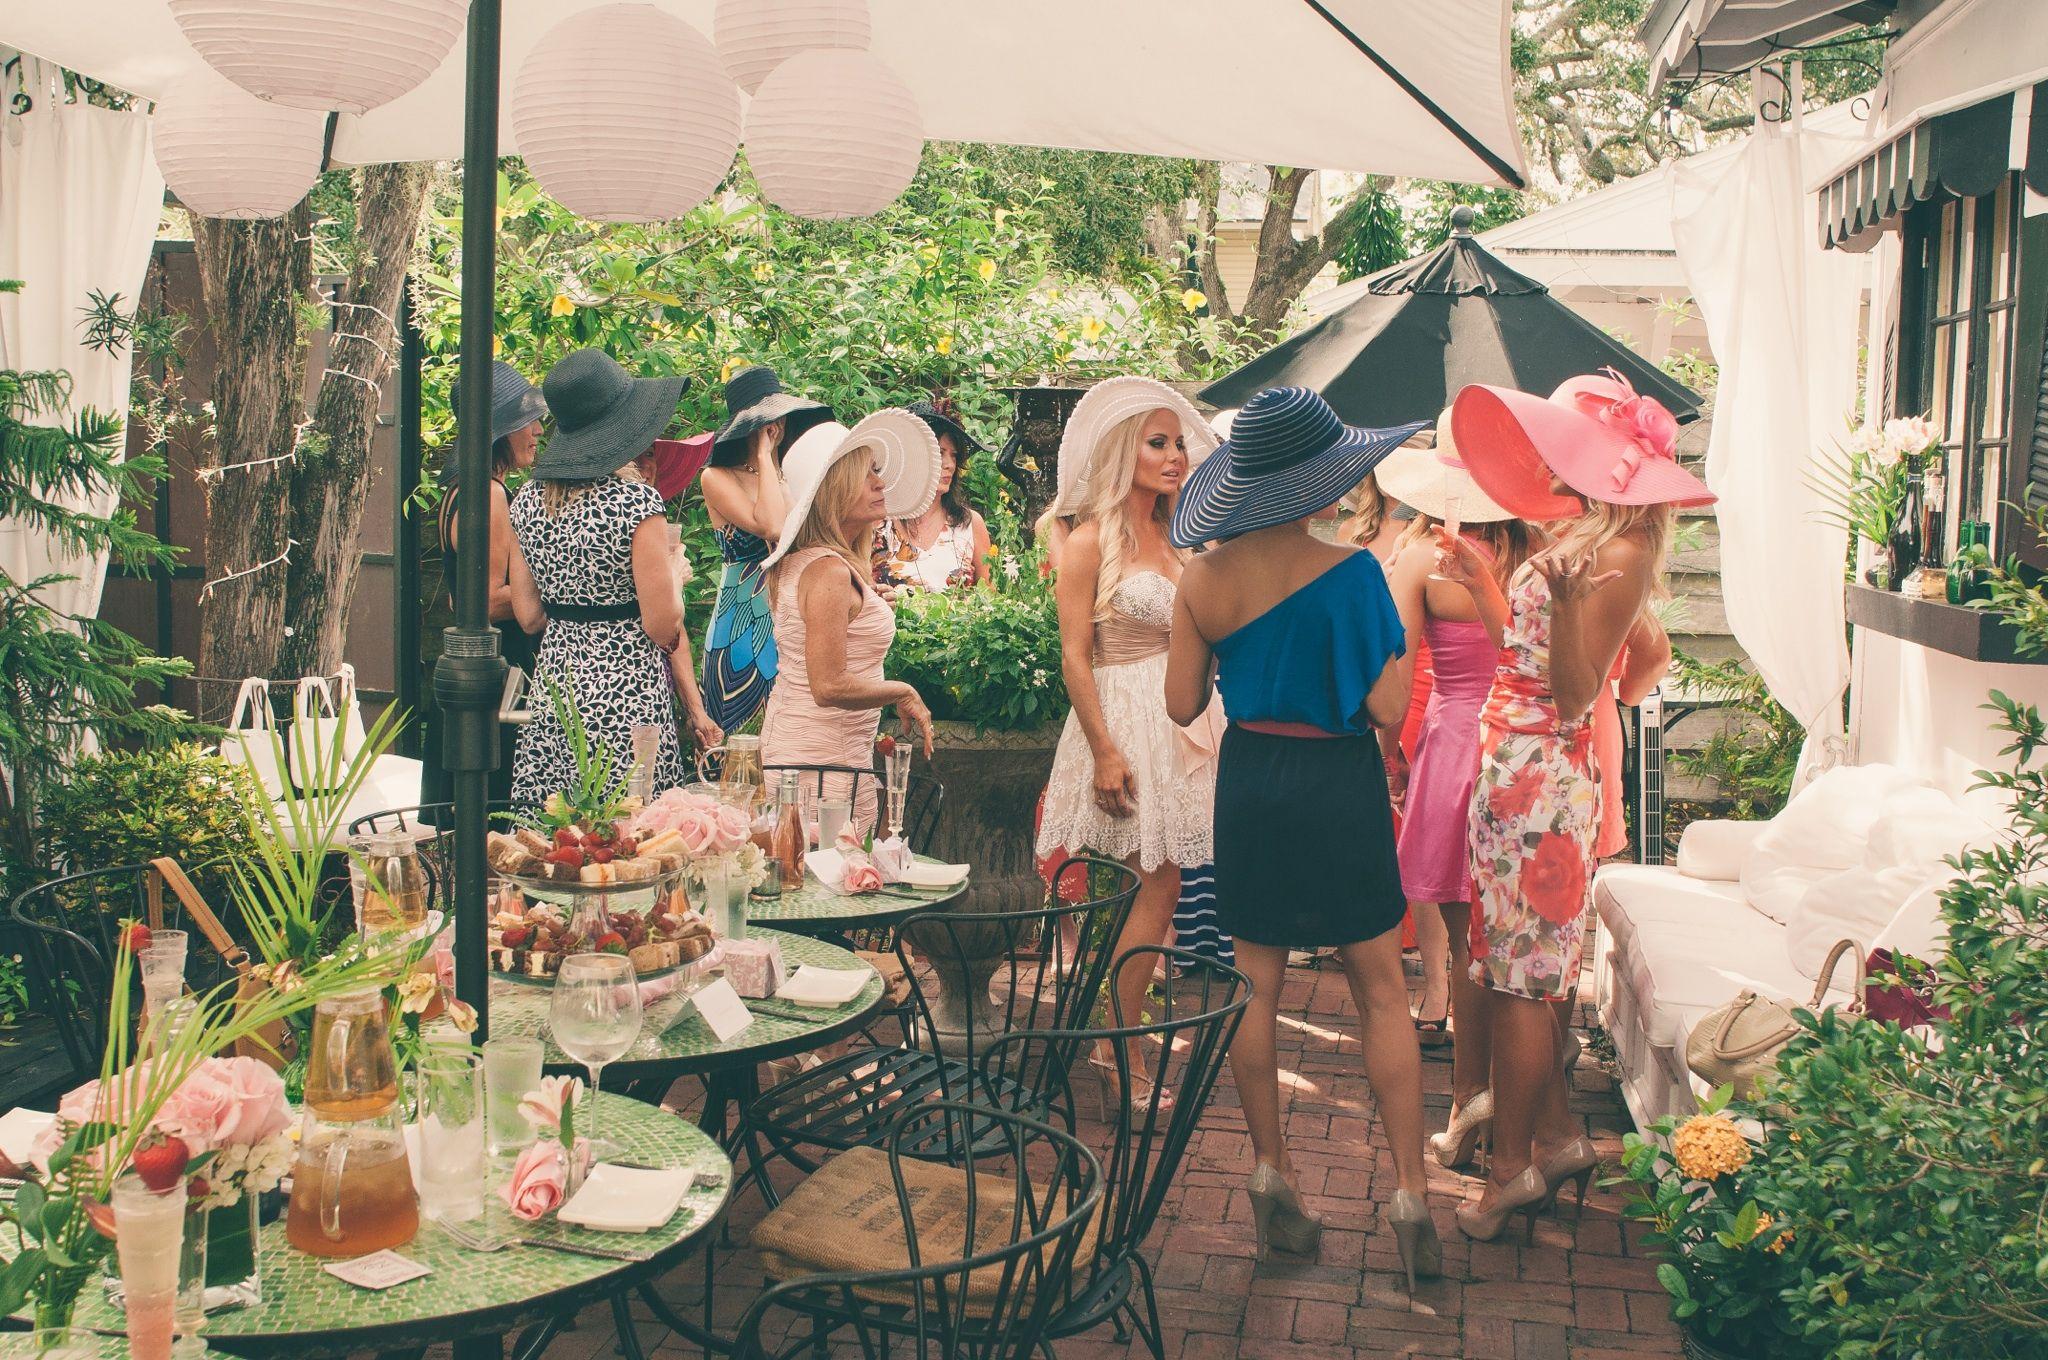 The Sweet Little Southern Charm By Tara Miller Tea Party Bridal Shower Bridal Shower Tea Party Theme Bridal Shower Tea [ 1360 x 2048 Pixel ]